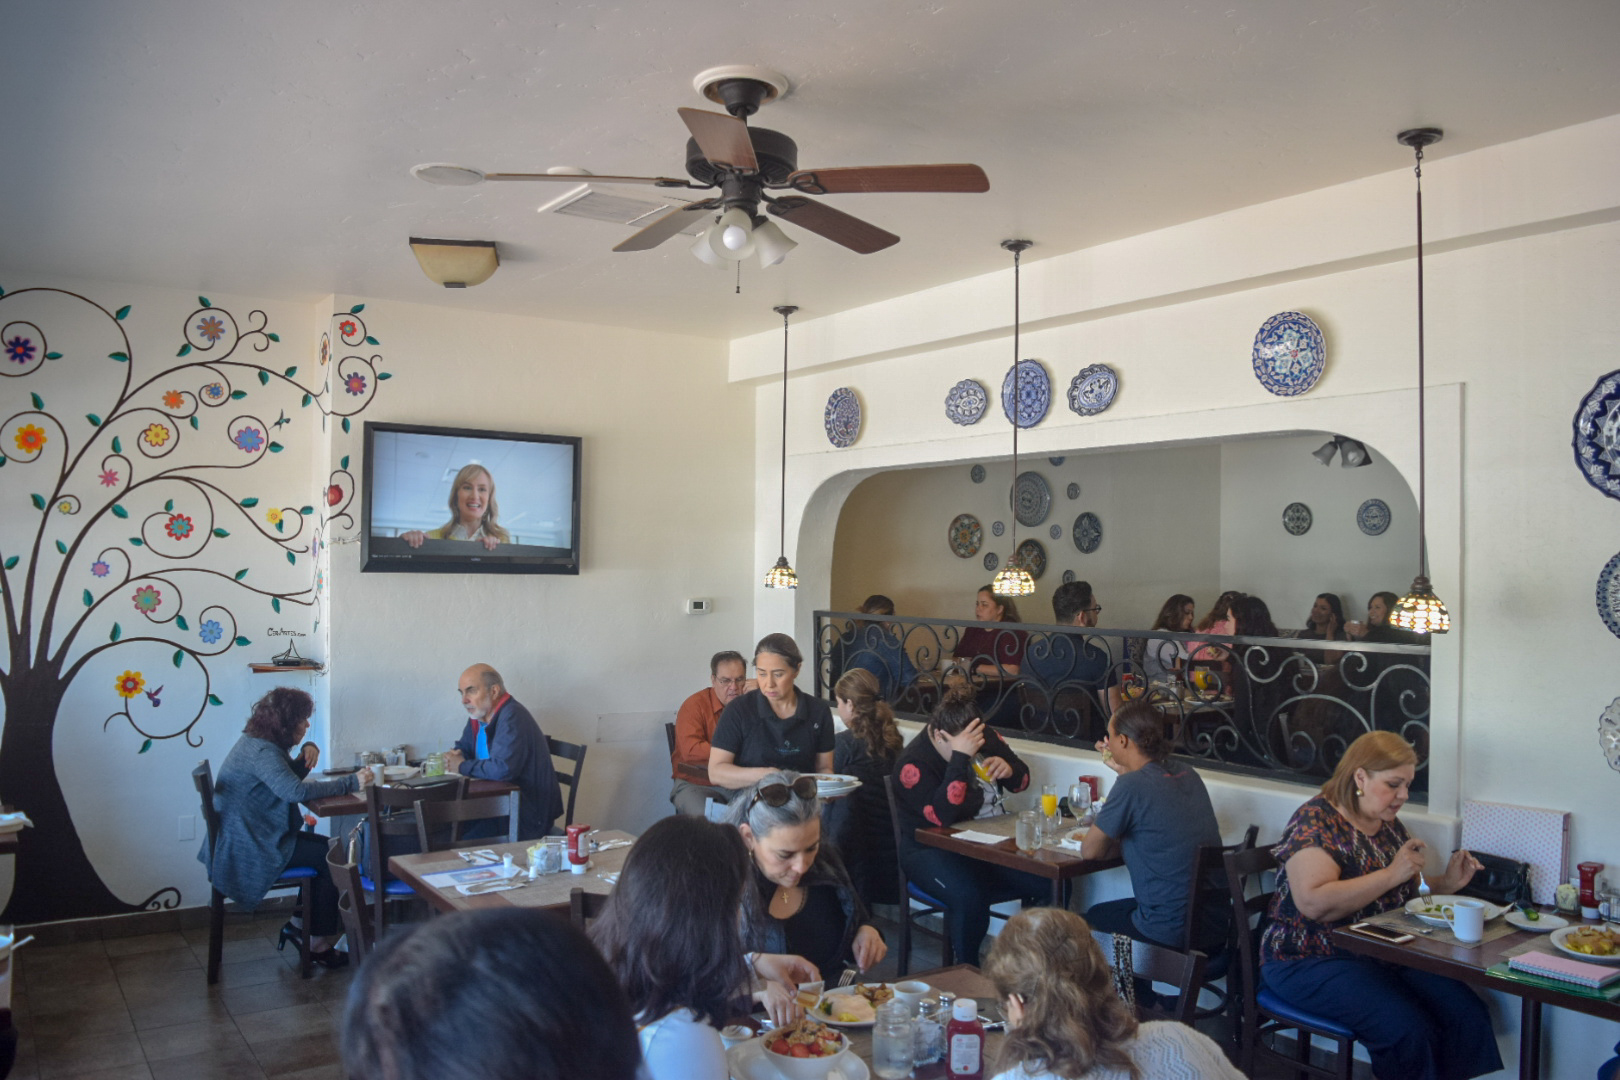 The San Diego Restaurant Bringing Tijuana Flavors Across the Border